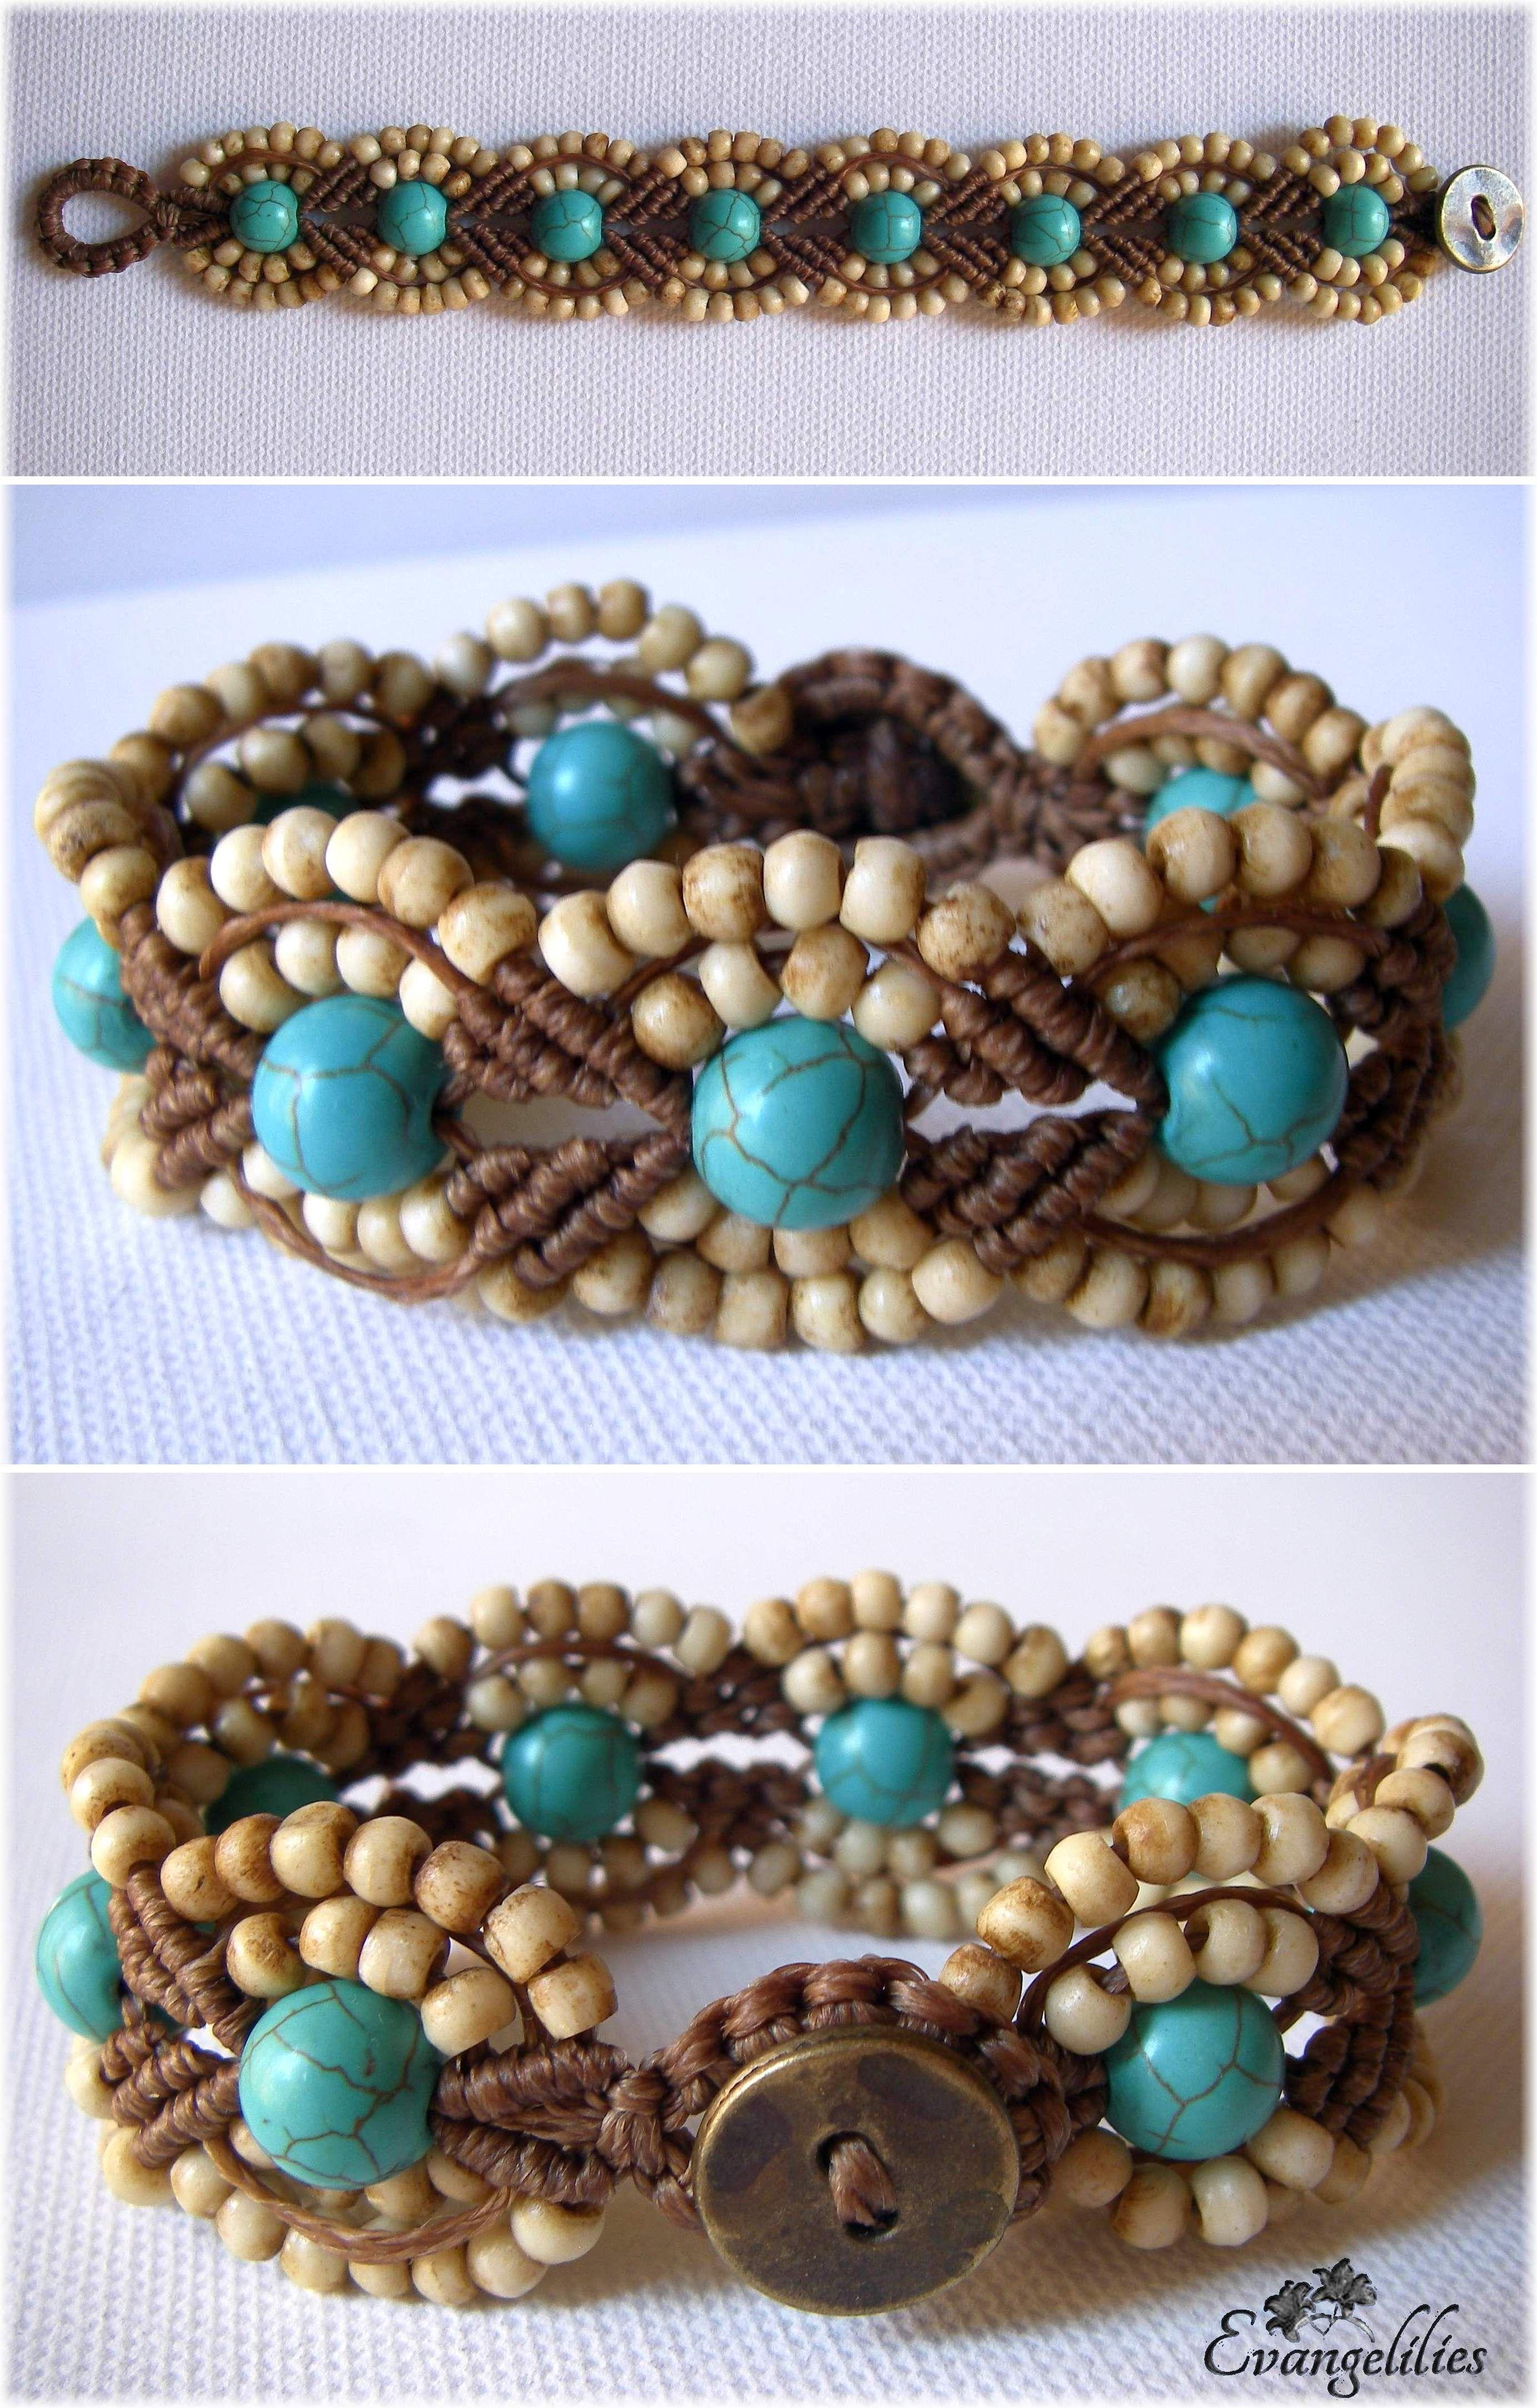 I love this pattern! It makes a wonderful macrame bracelet ...